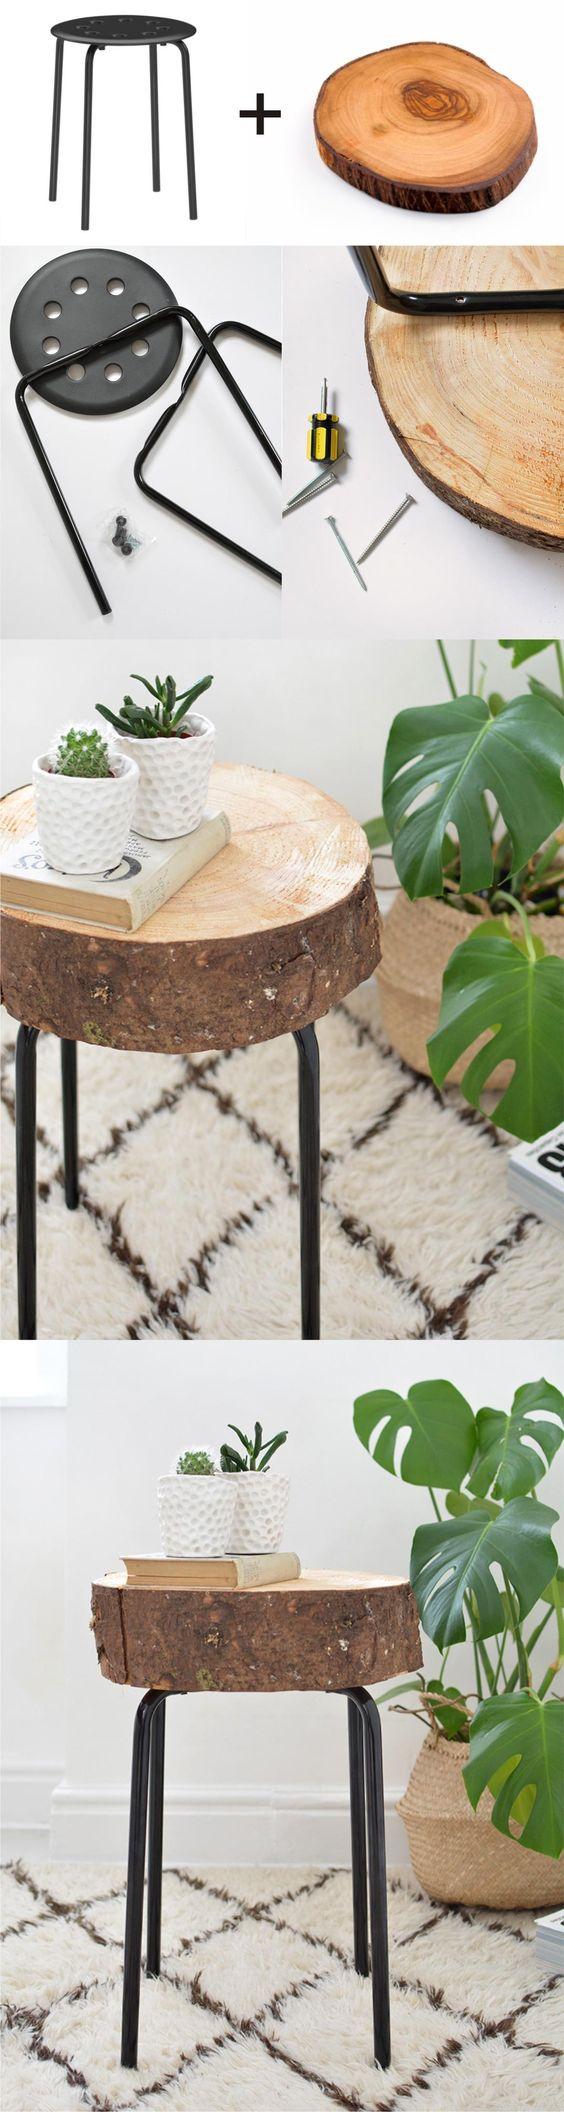 DIY Ikea Hack Wooden Stool.